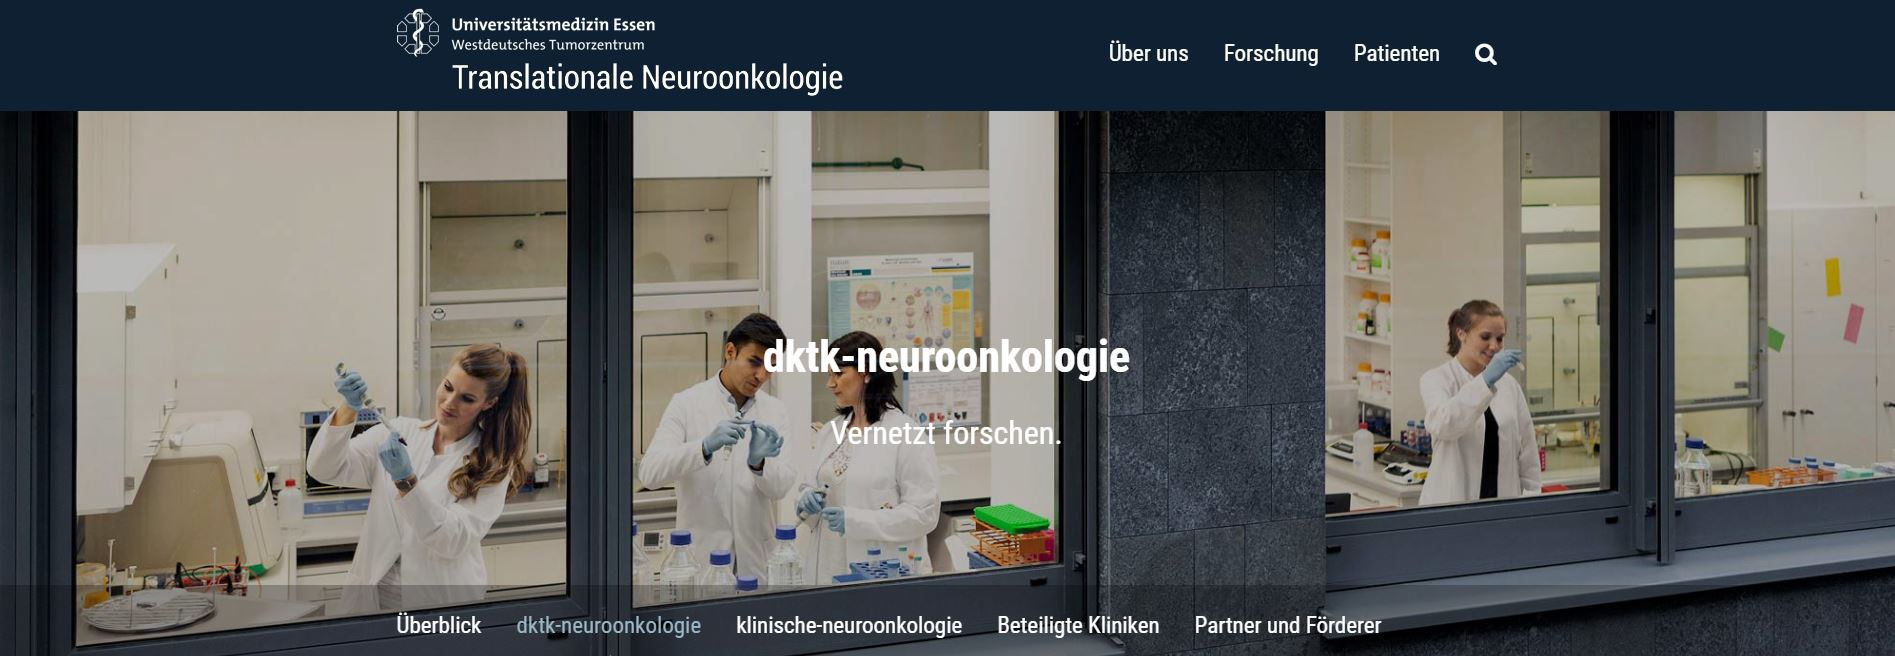 Translationale Neuroonkologie,Universitätsmedizin-Essen